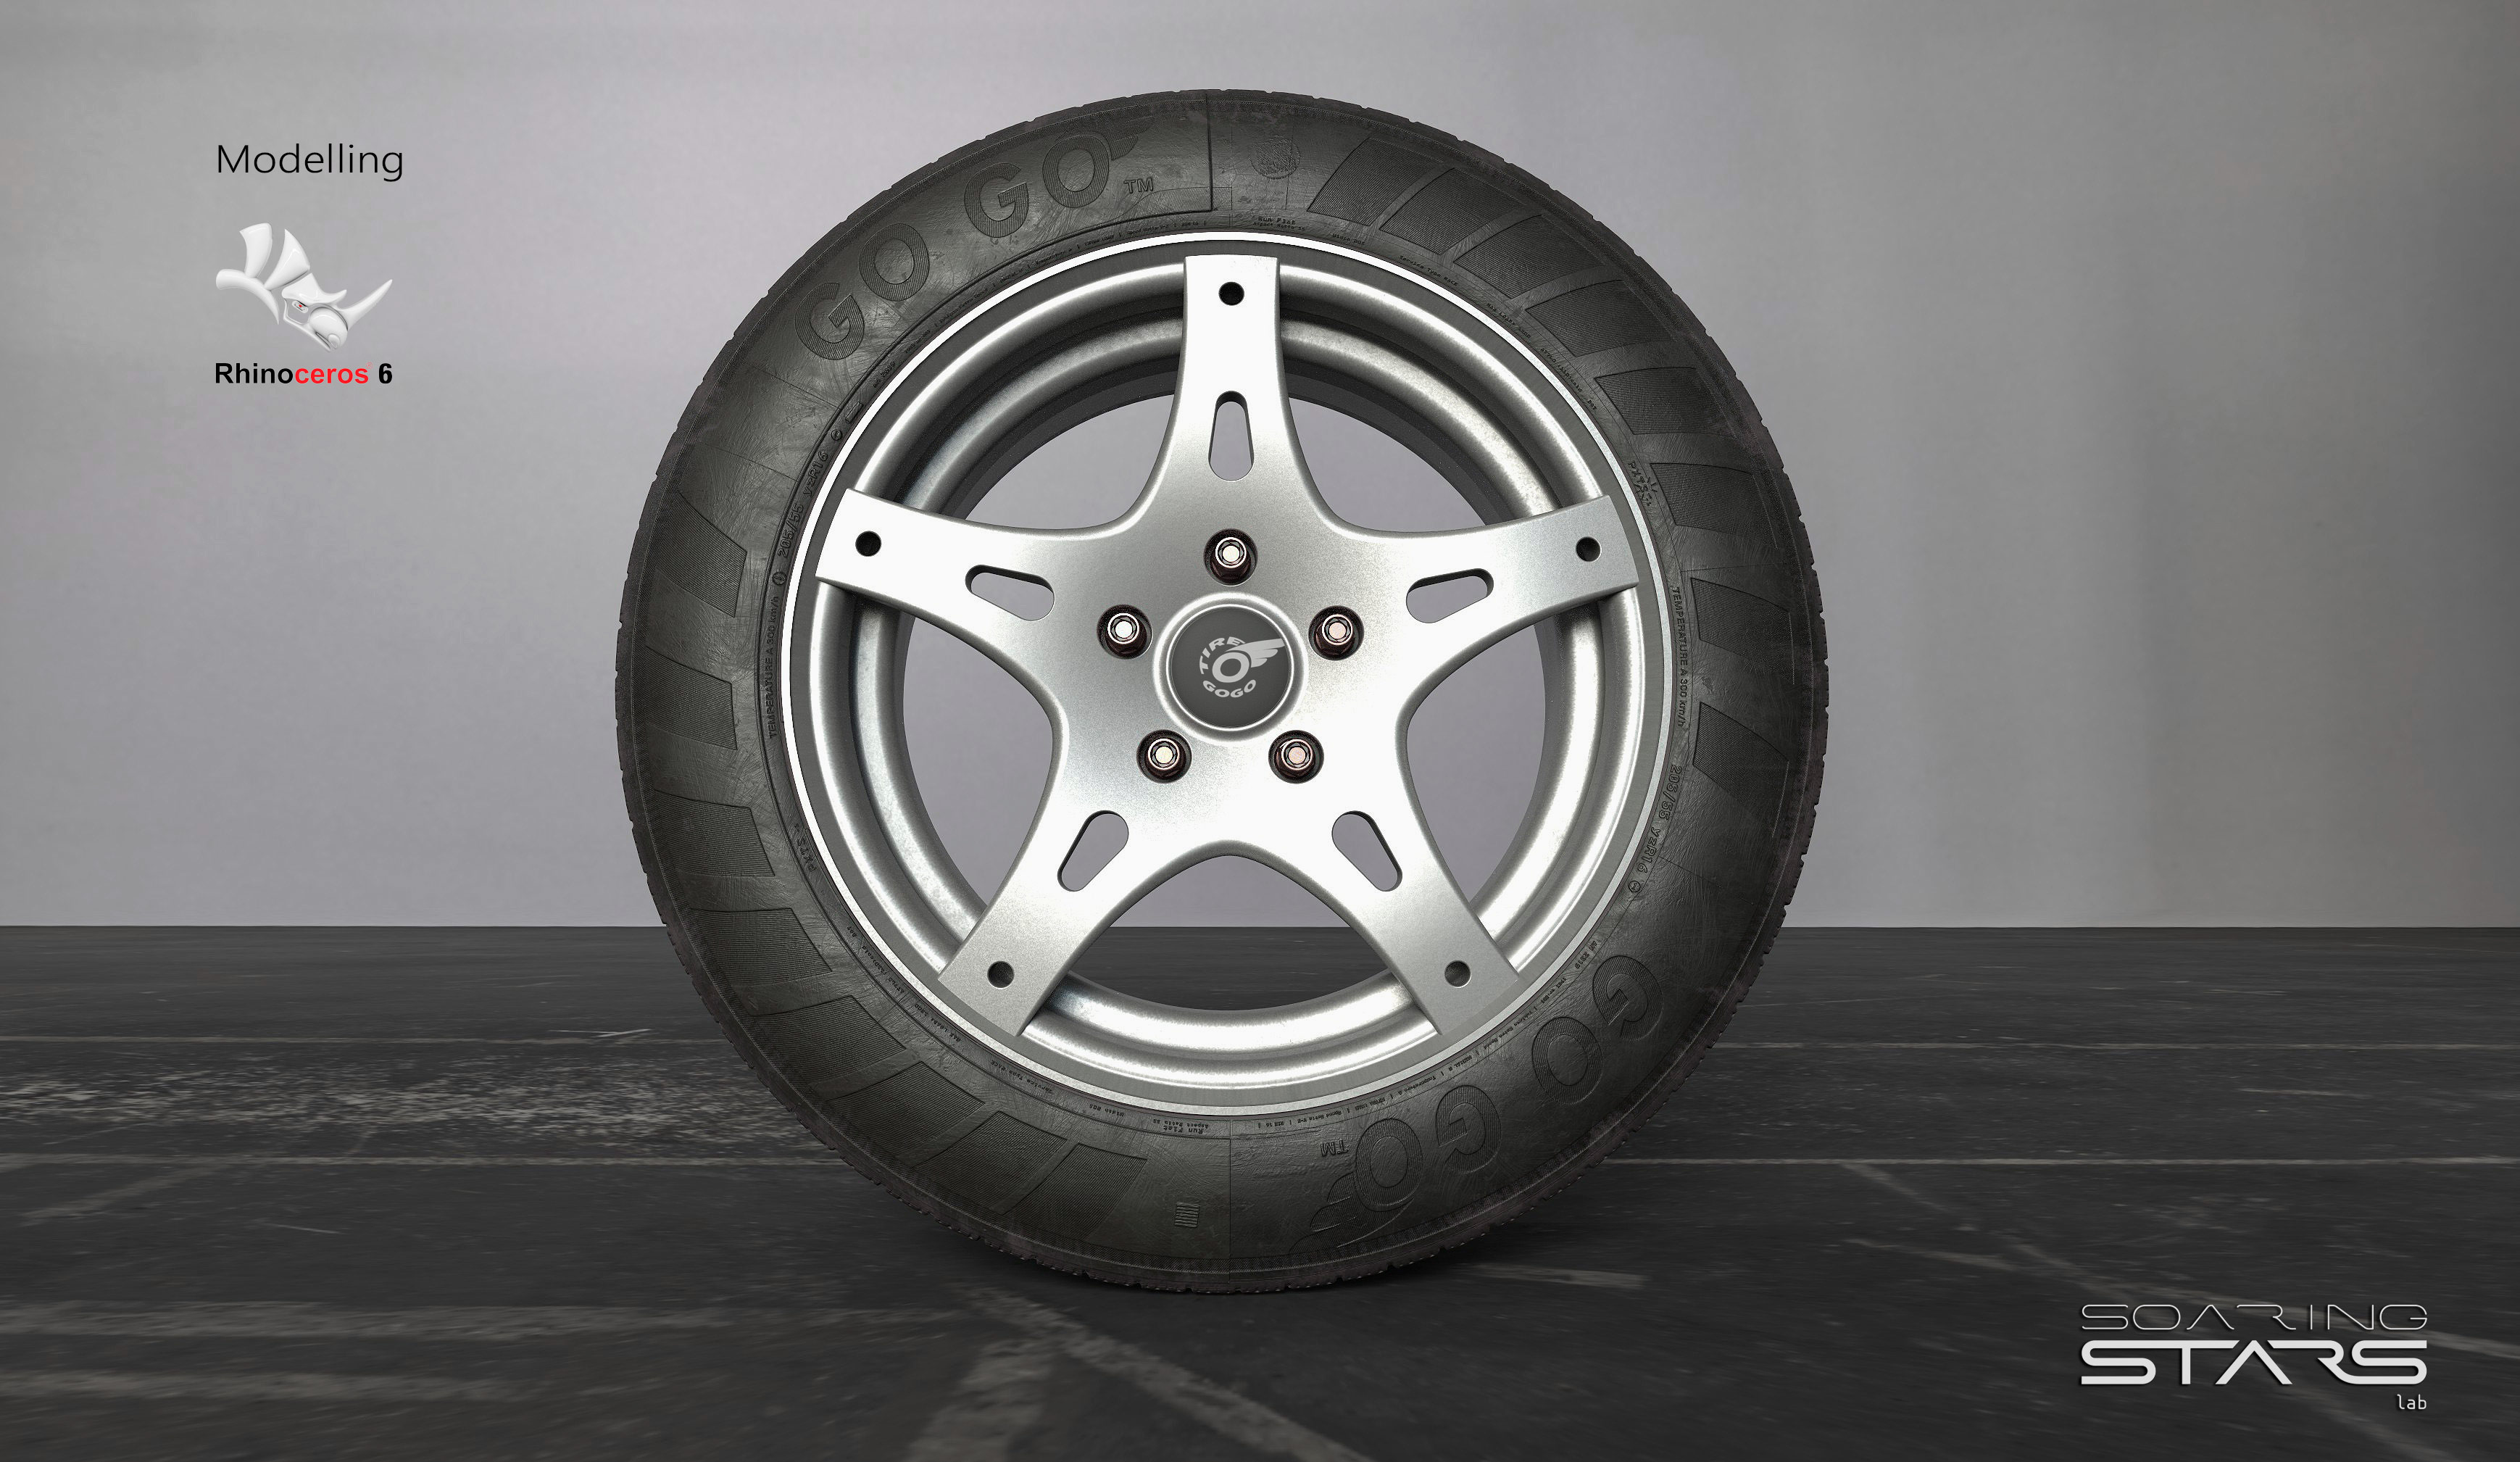 GOGO-Tire-205-55-R16-02.jpg